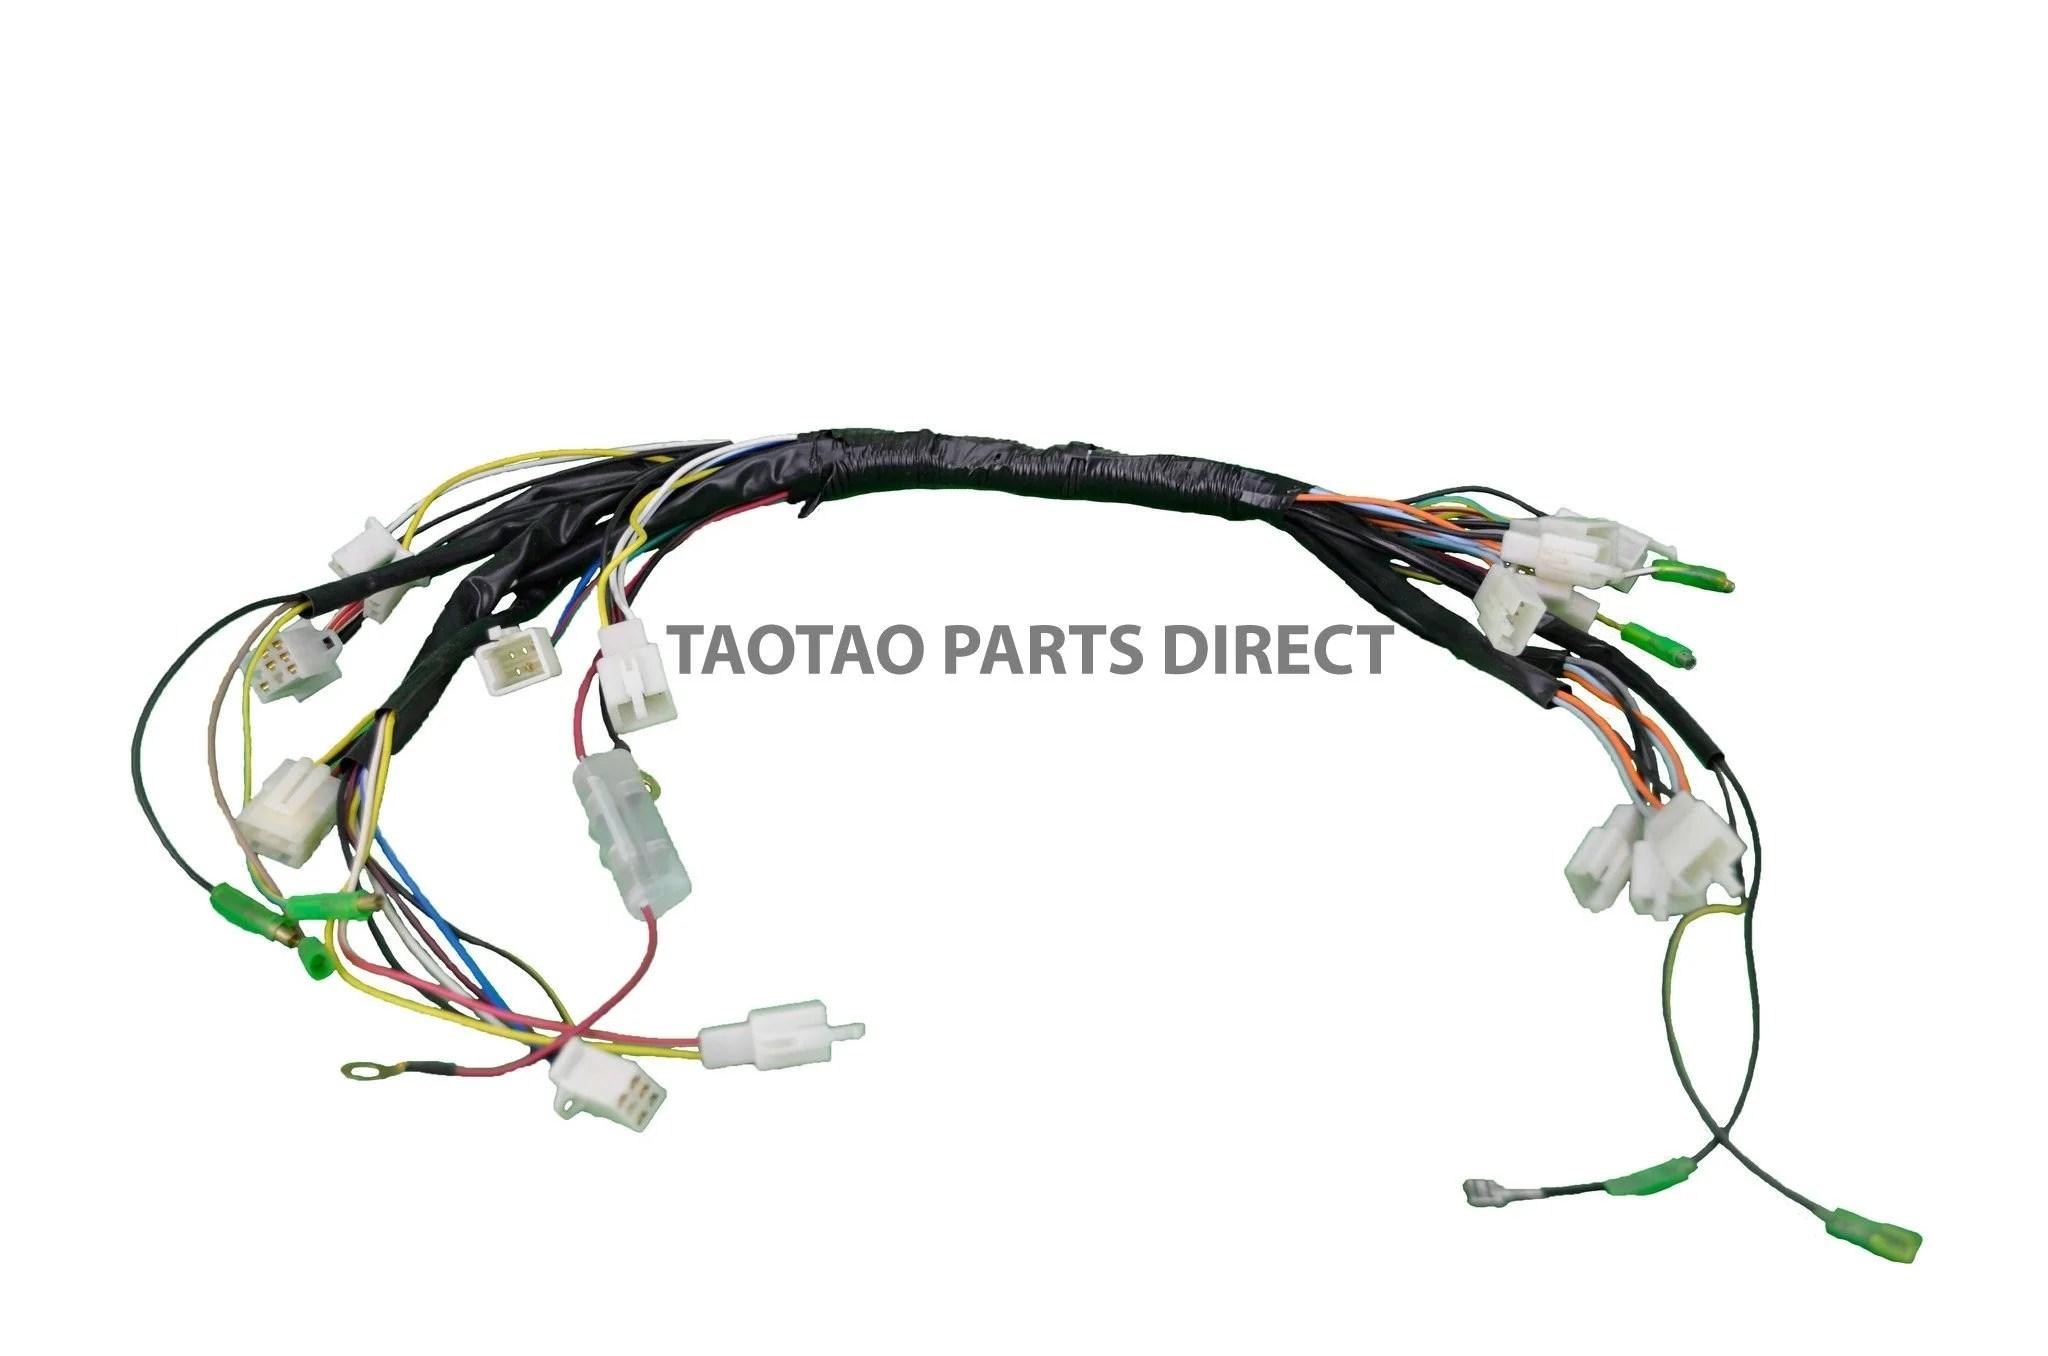 small resolution of ata125d wire harness 15 taotaopartsdirect com